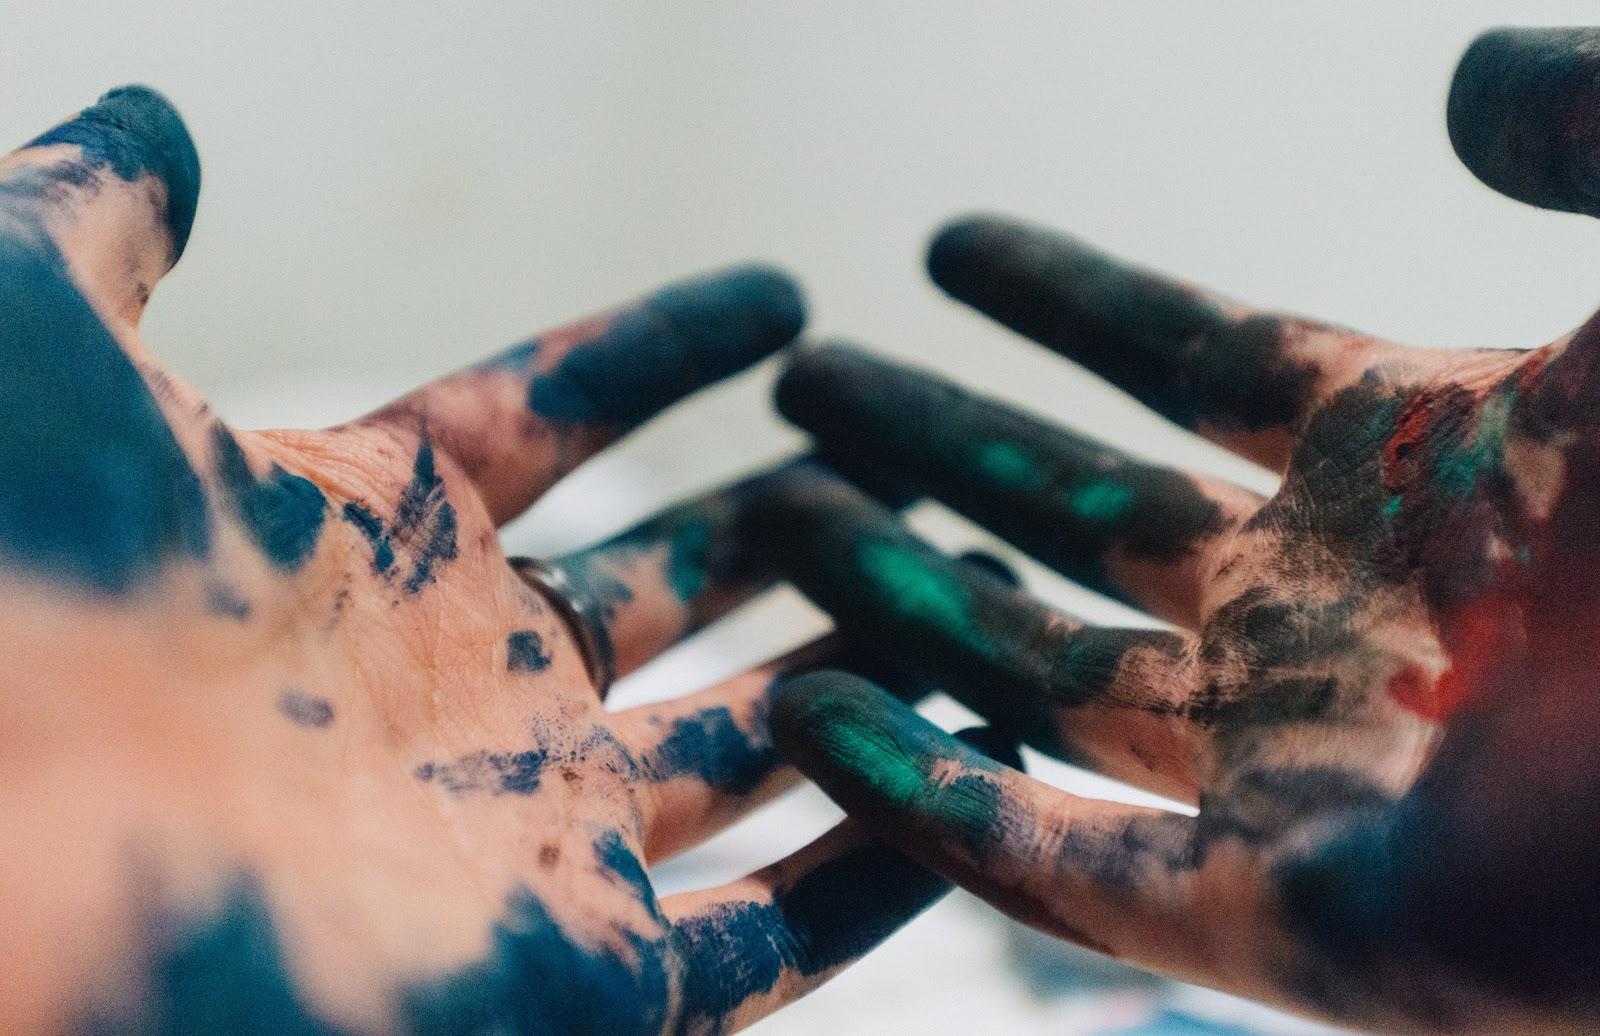 bad artistic habits to avoid